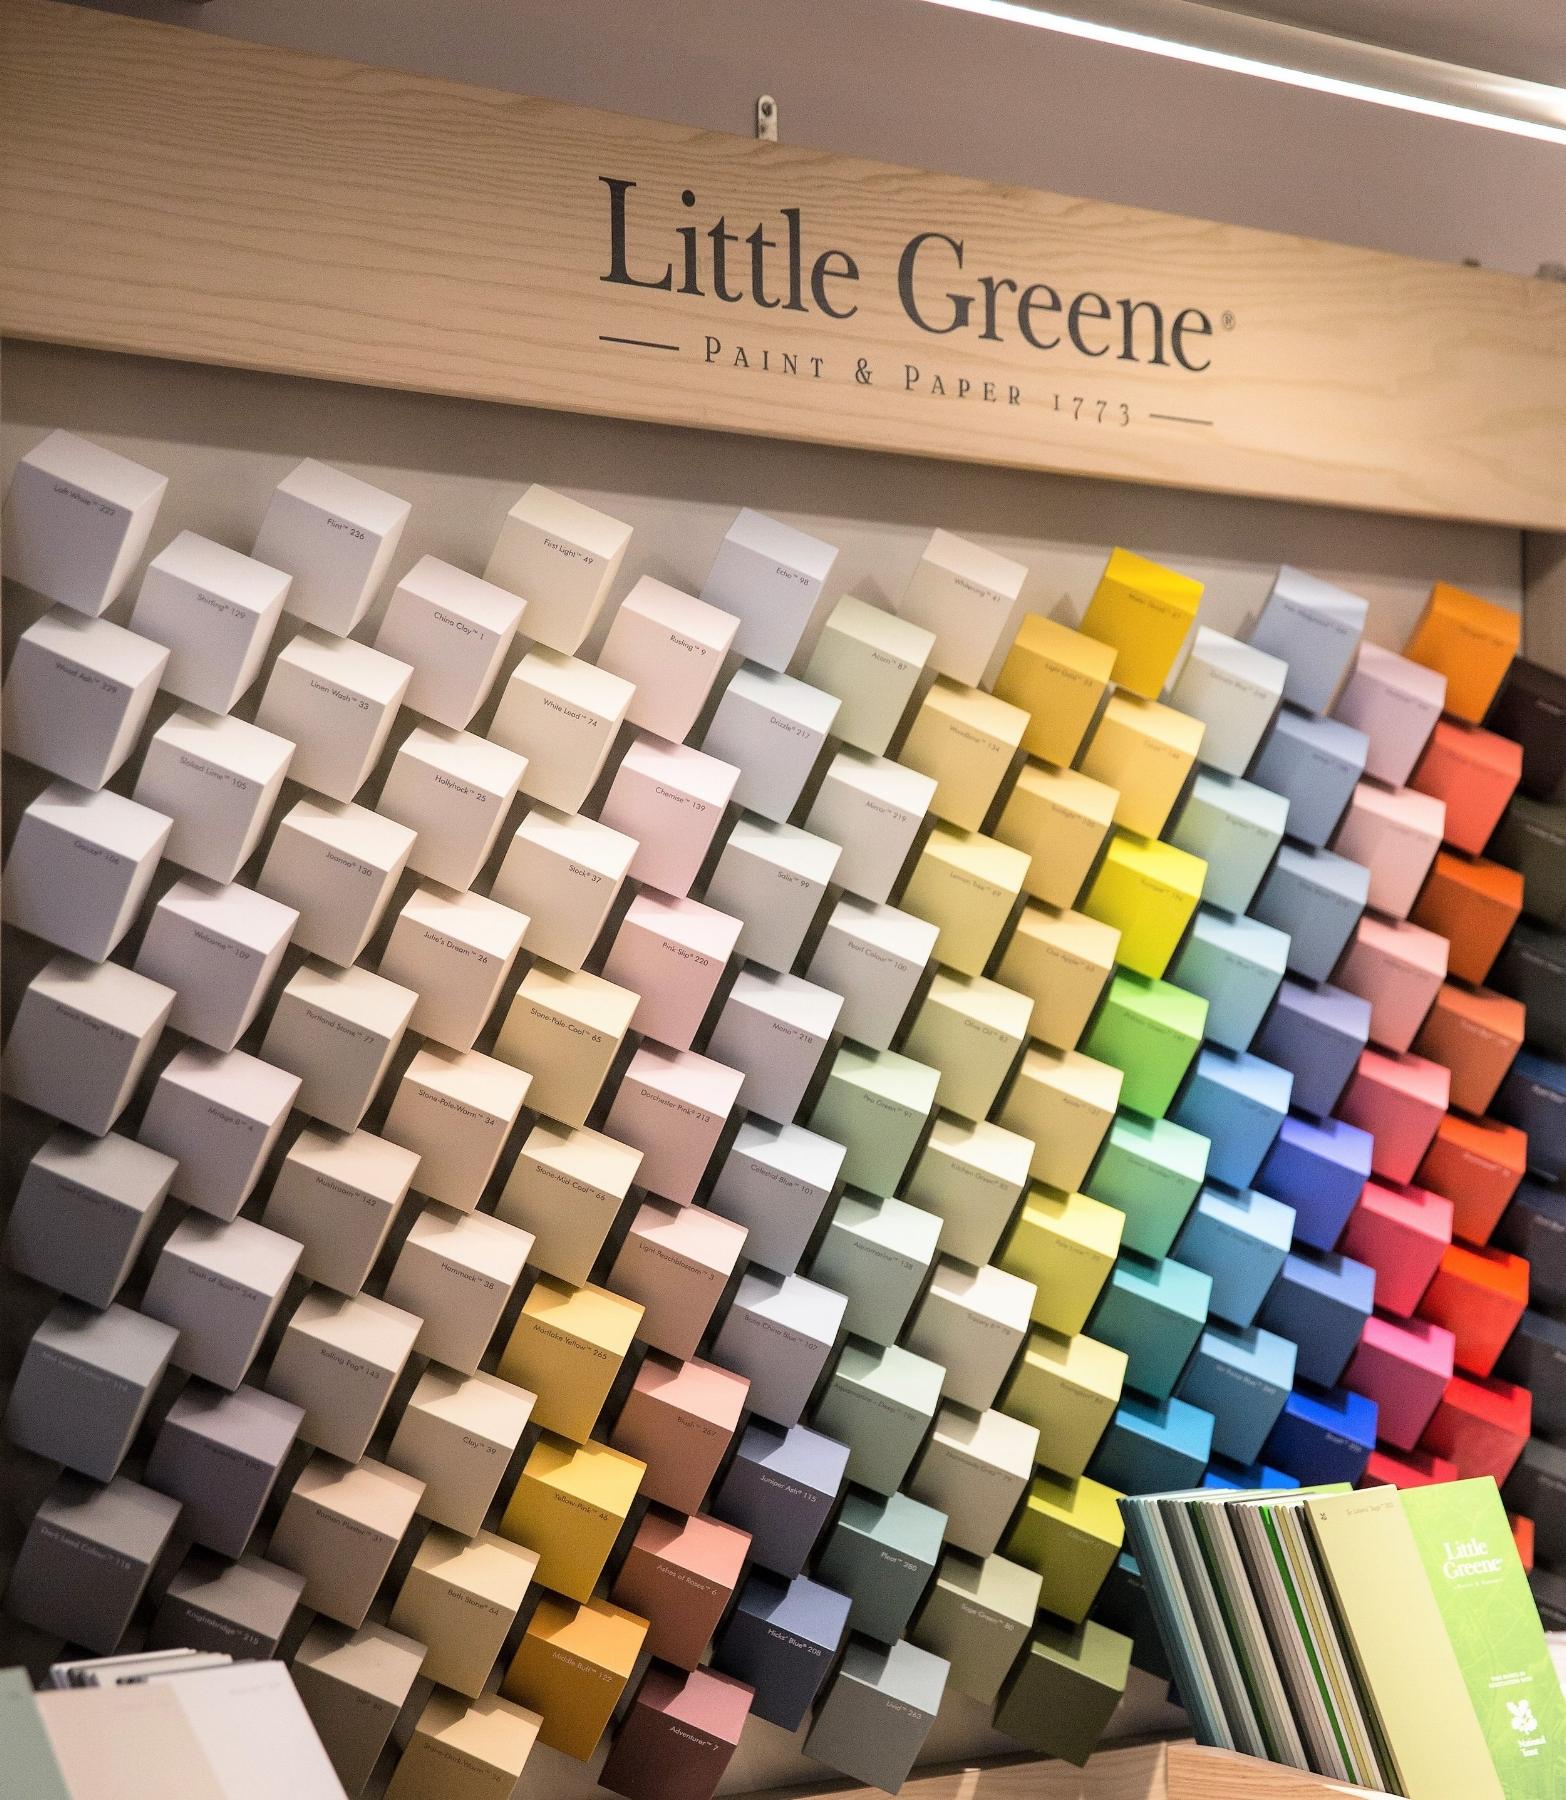 - LES PEINTURES LITTLE GREENEhttps://www.littlegreene.fr/paint/colour